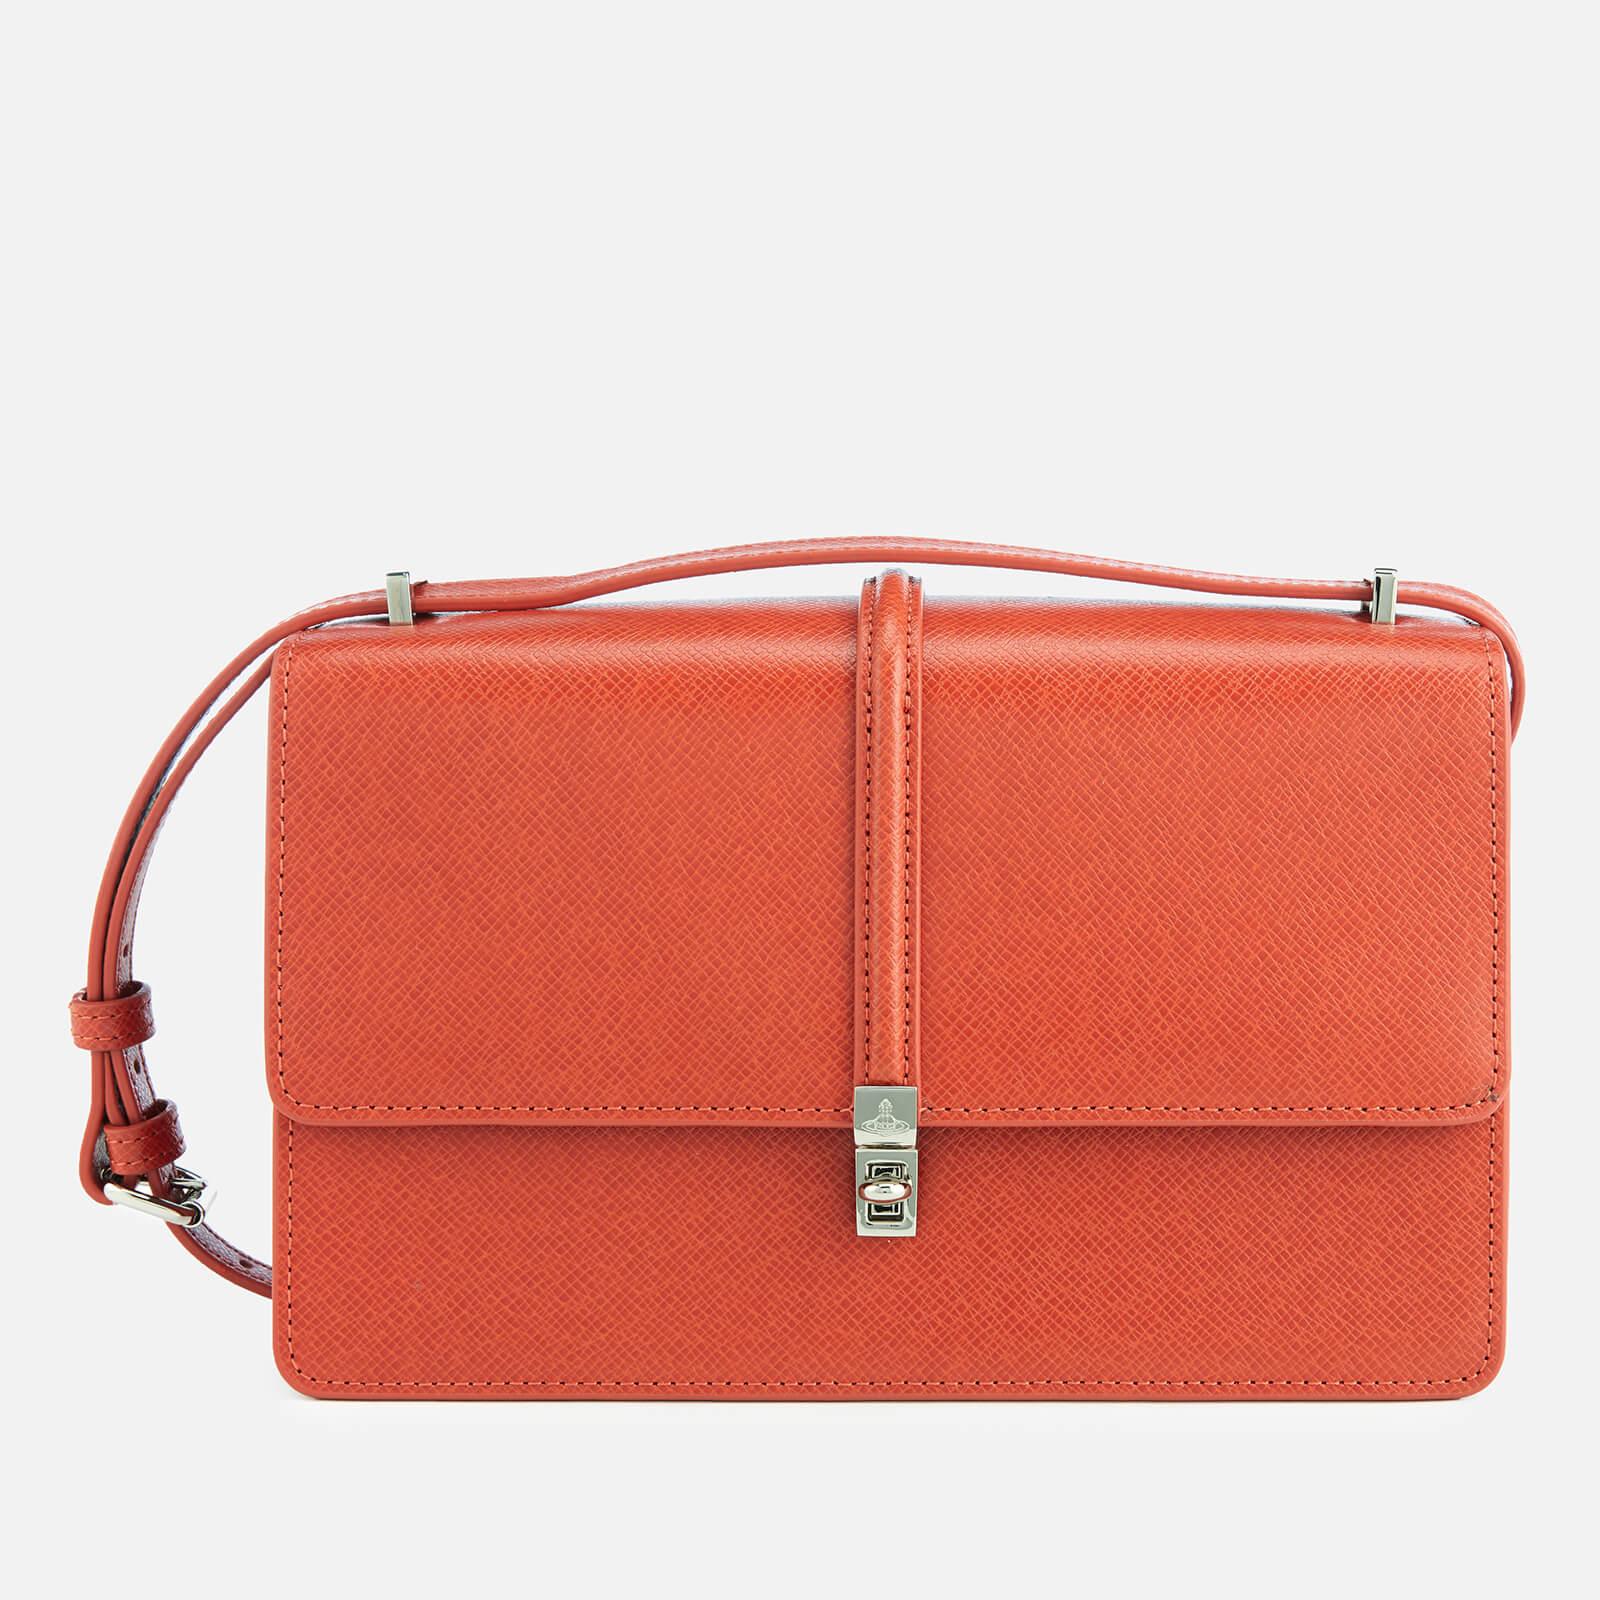 Vivienne Westwood Women s Sofia Small Cross Body Bag - Orange - Free UK  Delivery over £50 02cf7353efbf1